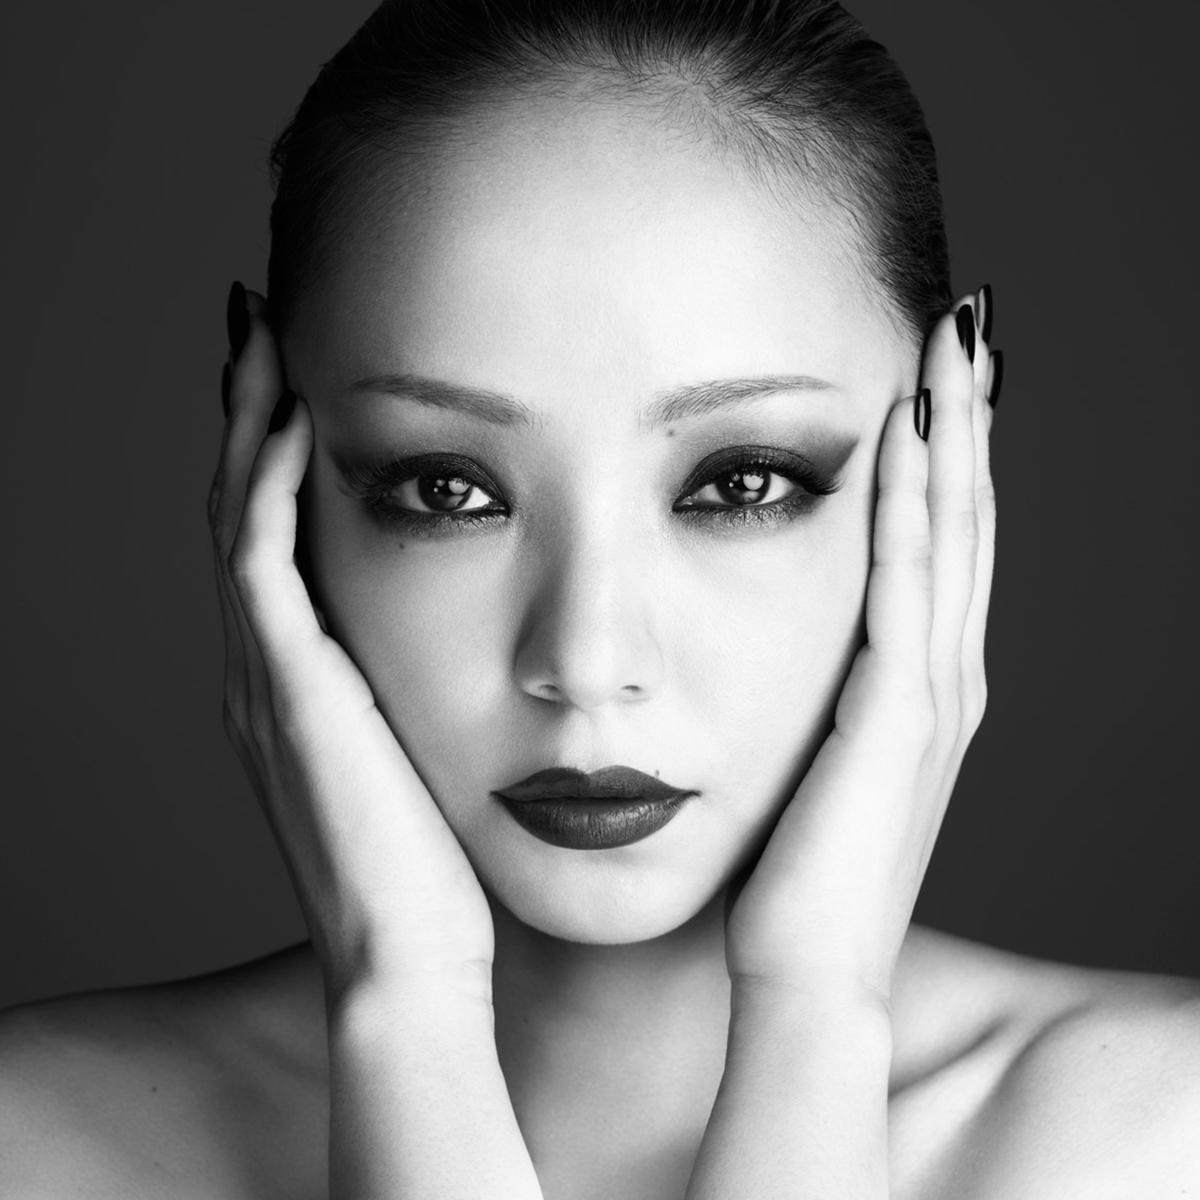 Namie-Amuro-Feel-2013-1200x1200.png